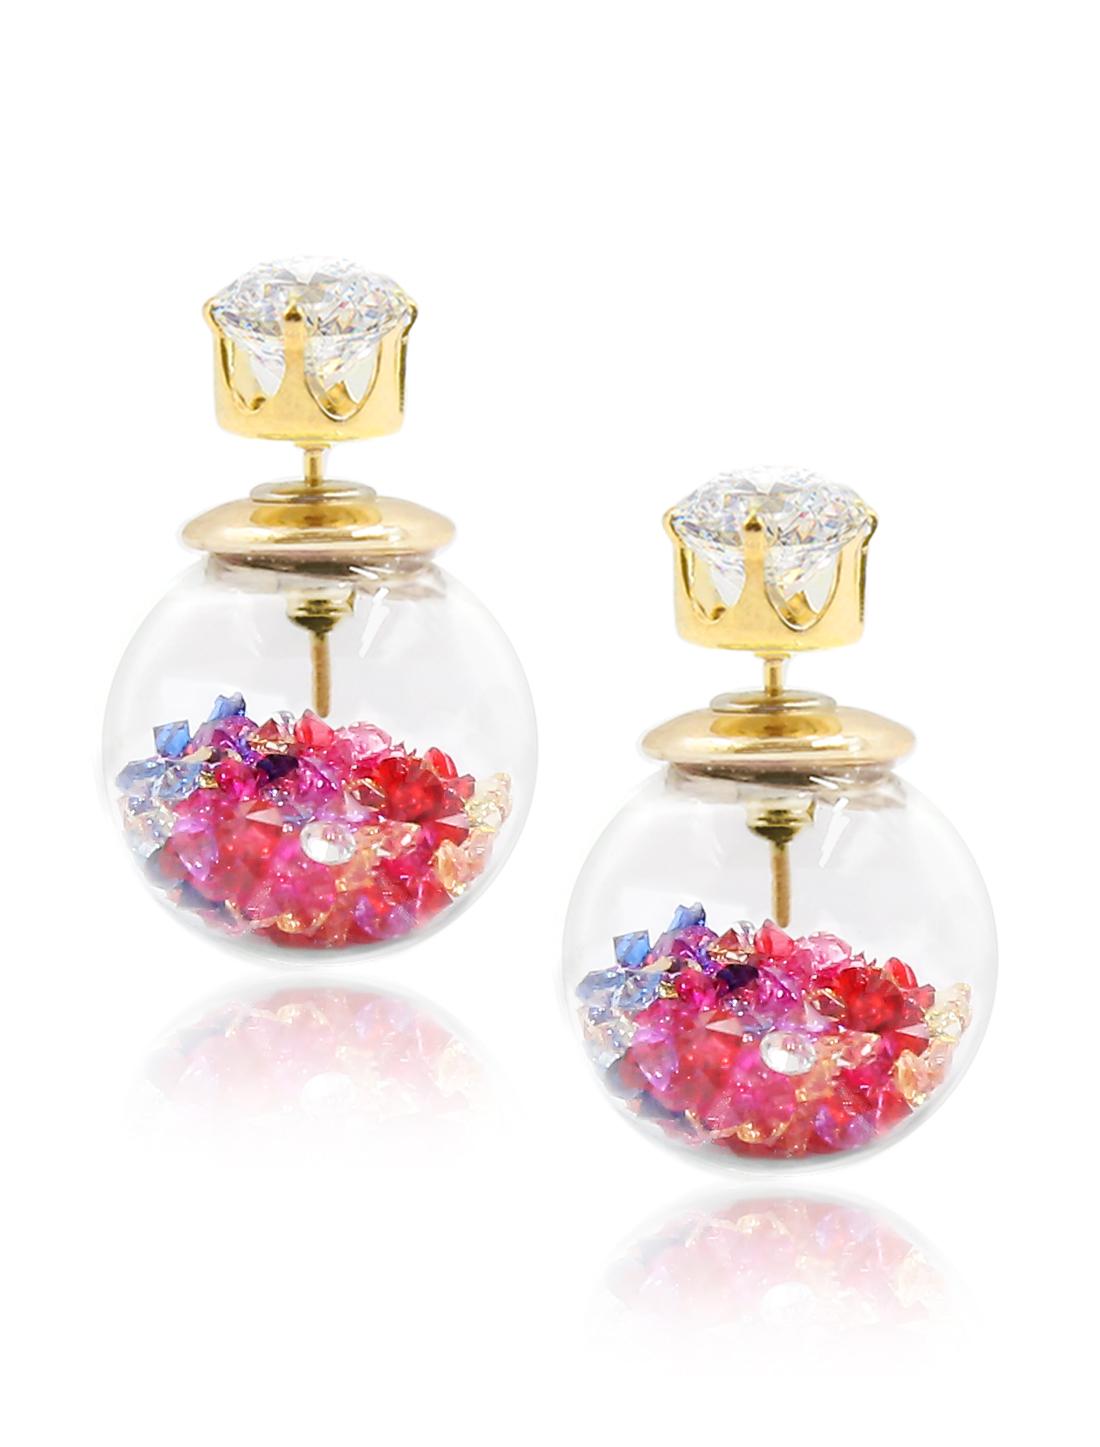 Fashion Women Elegant Double Sides Zircon Transparent Ball Faux Crystal Earrings Ear Stud 1 Pair Multi-colored